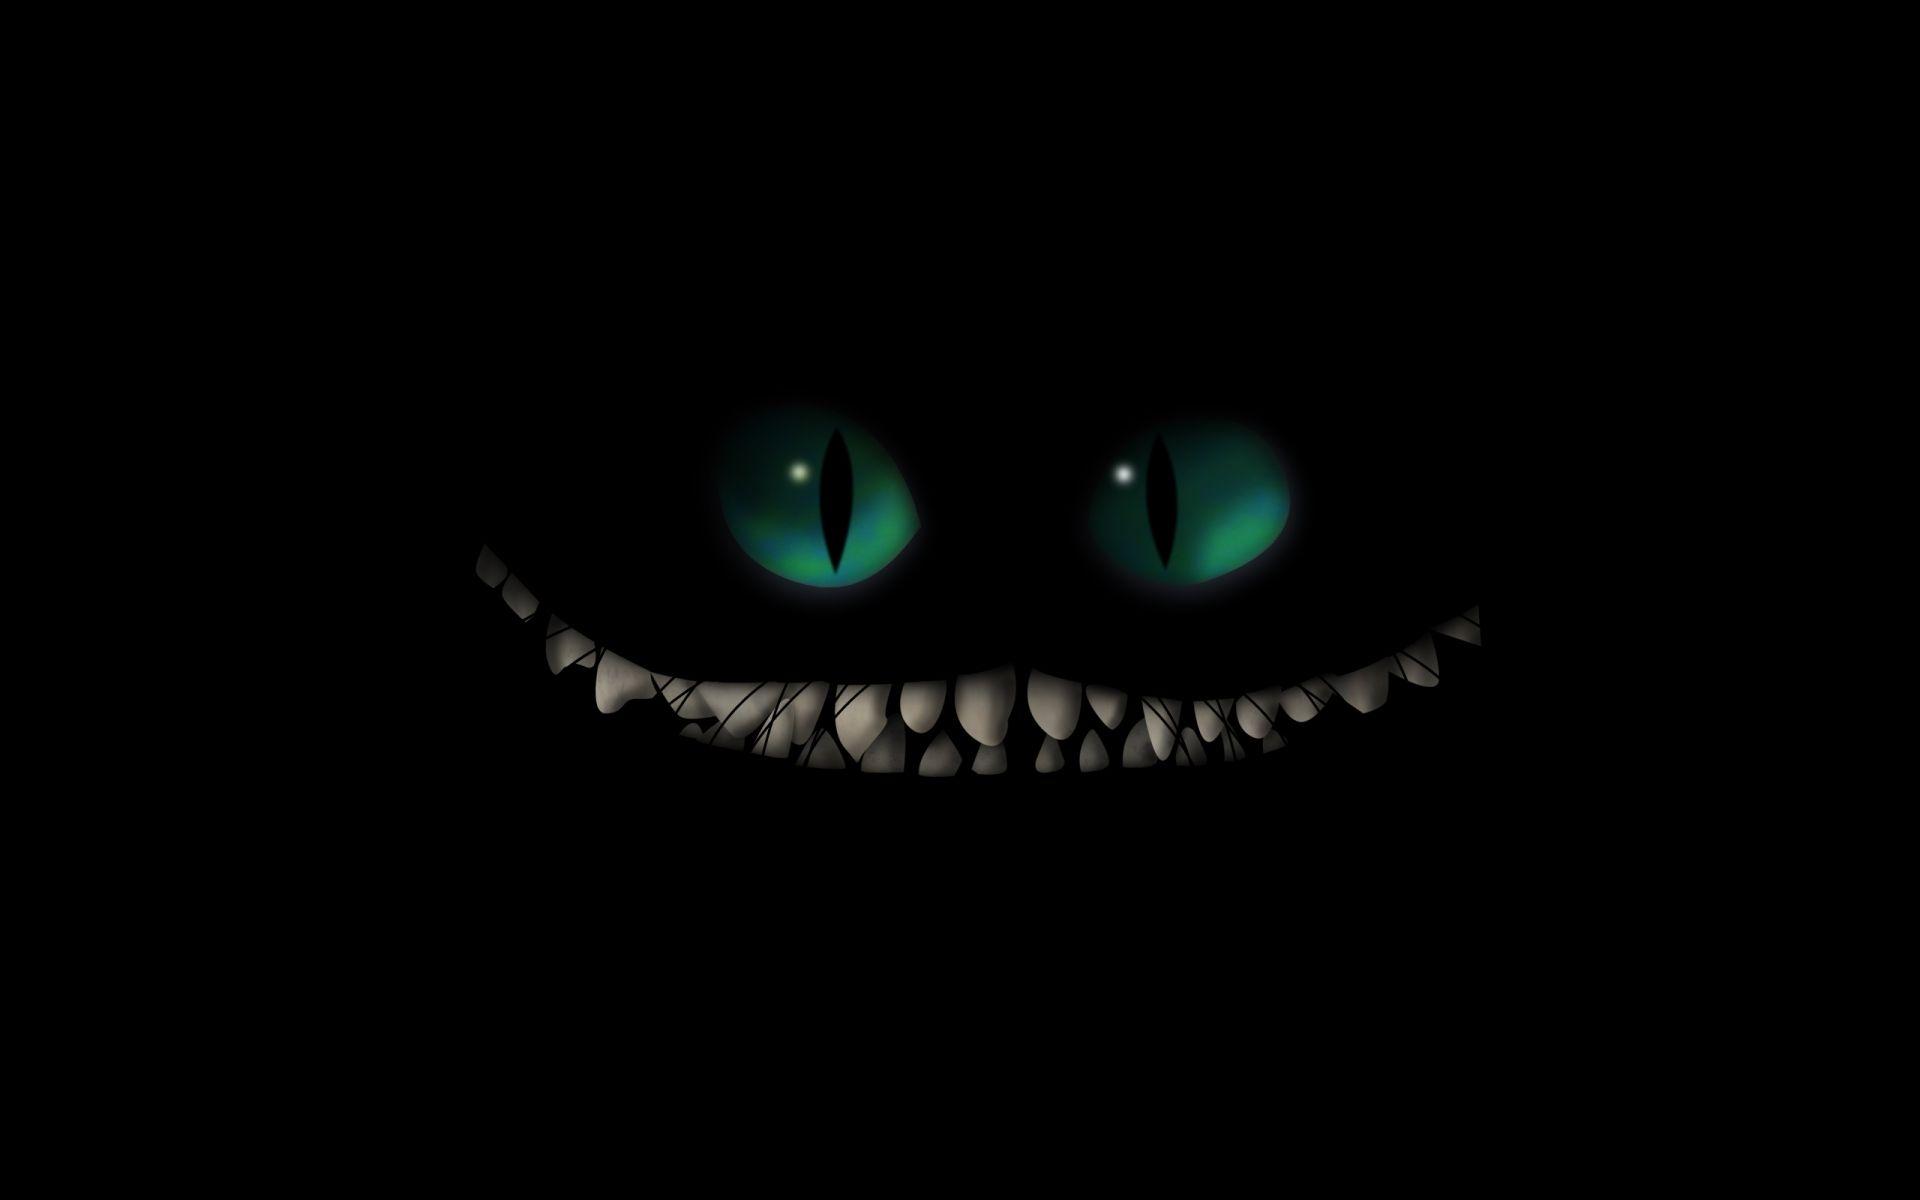 Dark Monster Creature Fangs Evil Scary Creepy Spooky Halloween Wallpaper 1920x1200 28141 Wallp Scary Wallpaper Cheshire Cat Wallpaper Halloween Wallpaper